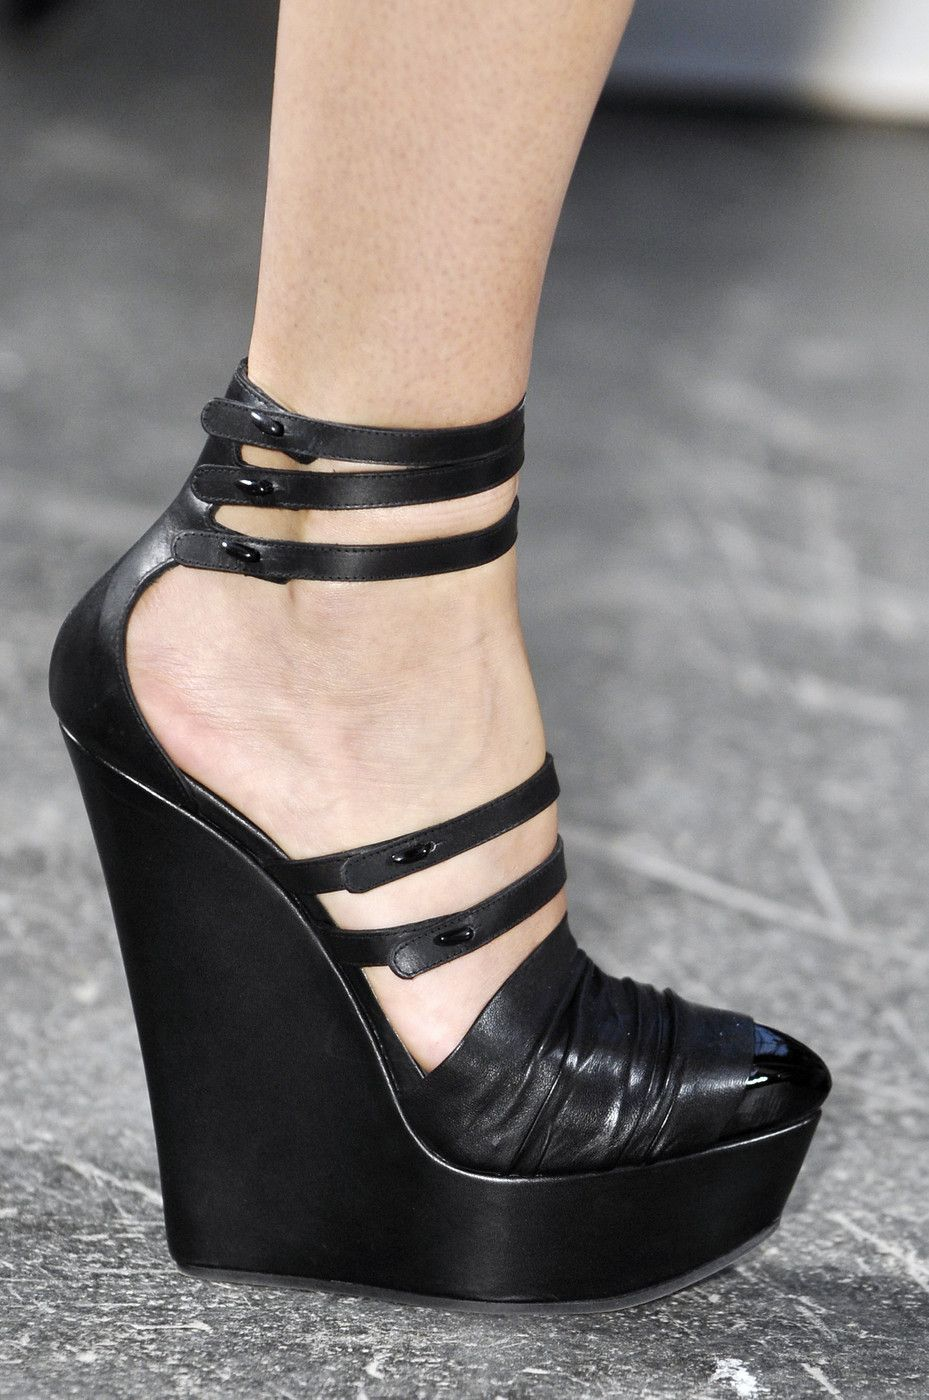 Givenchy Fashion At Spring 2010 2019Shoes In Week Paris 5Rq3A4jL